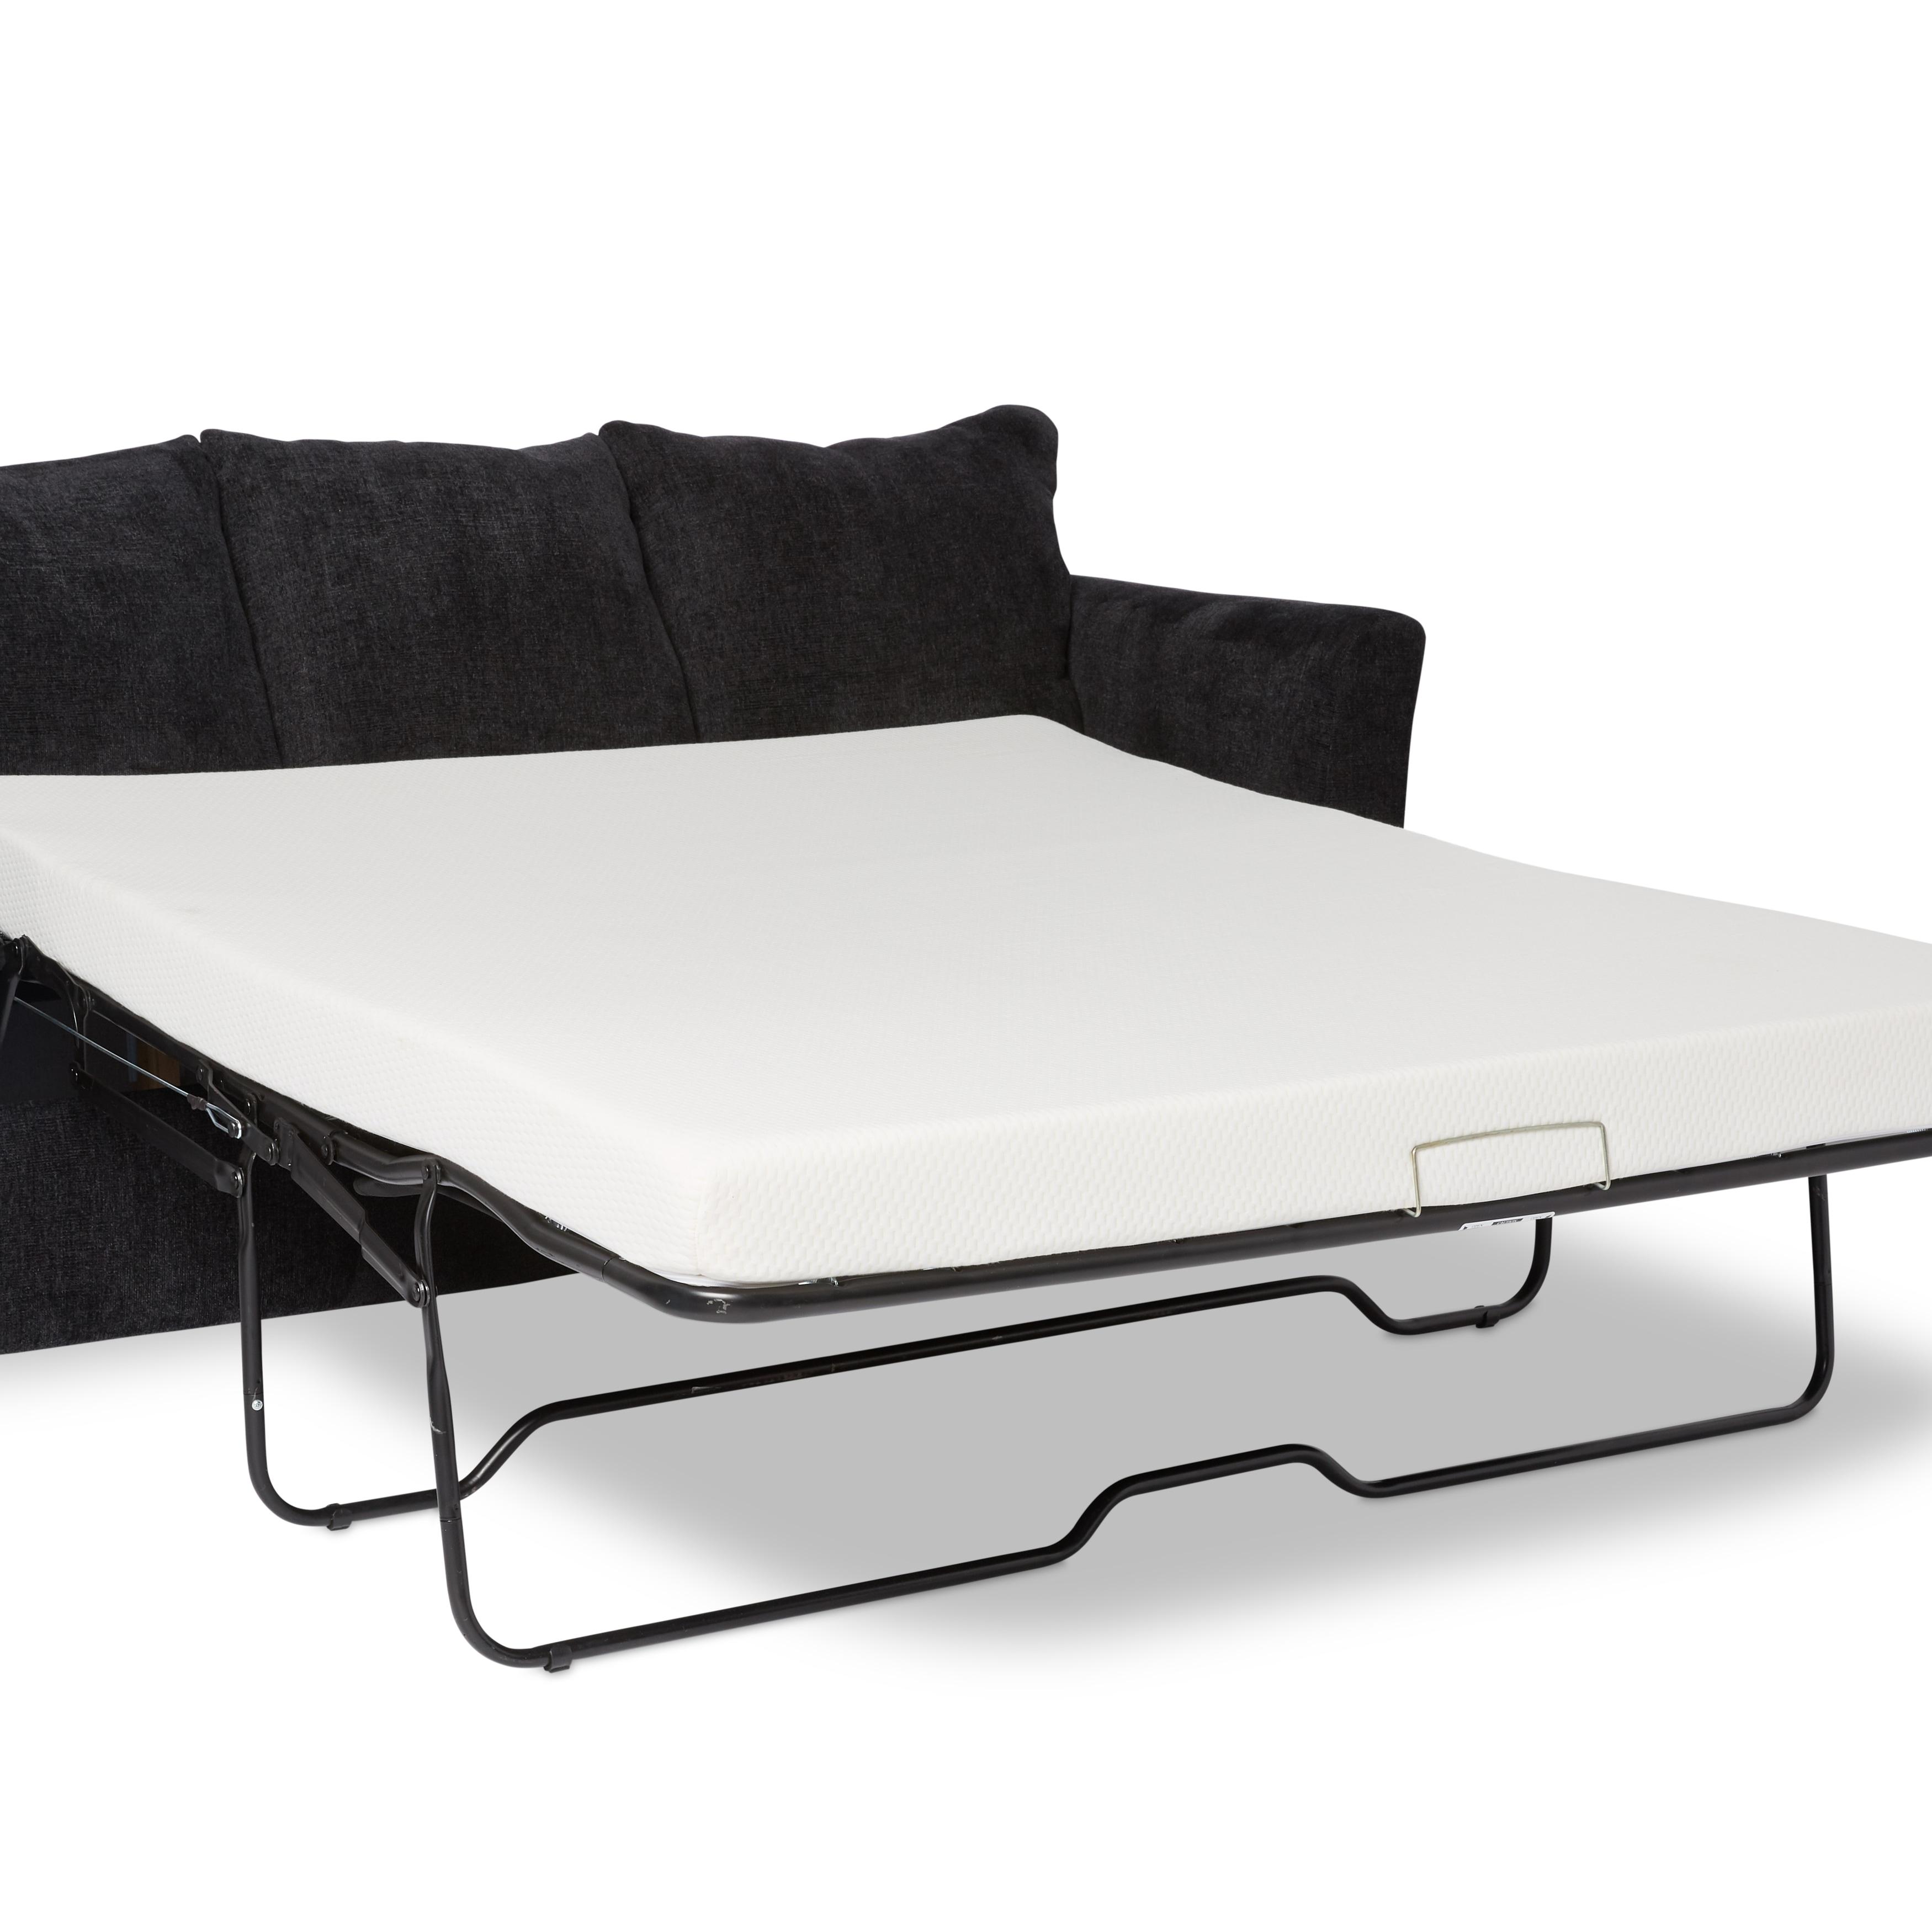 Sofa Sleeper Full Size Bed Coffee Tables Ideas